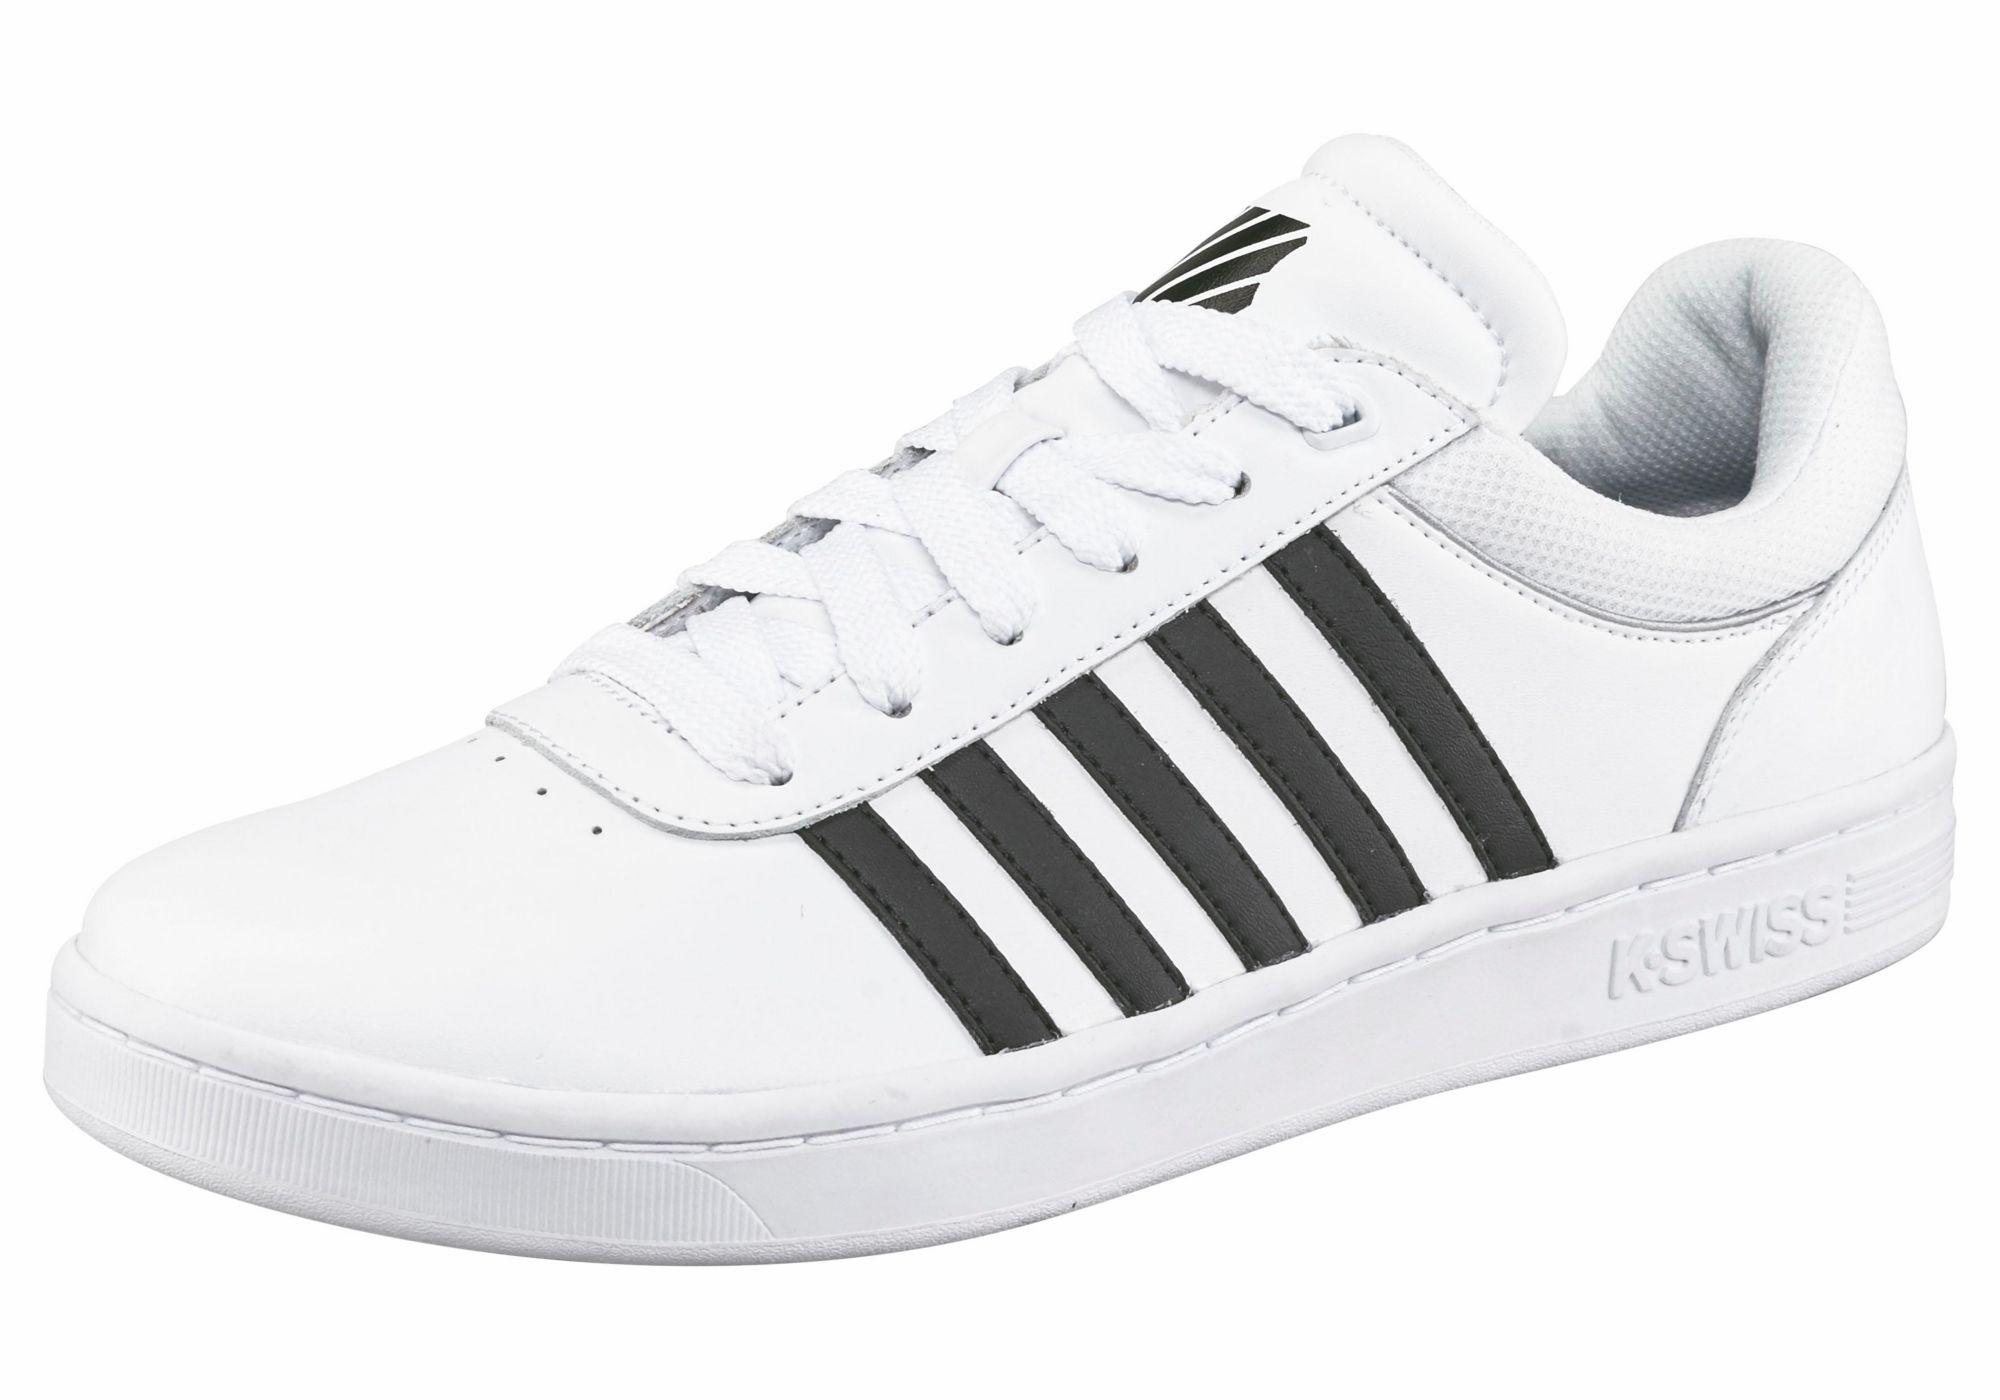 COURT CHESWICK - Sneaker low - black/white VaIIEJZ4Mk